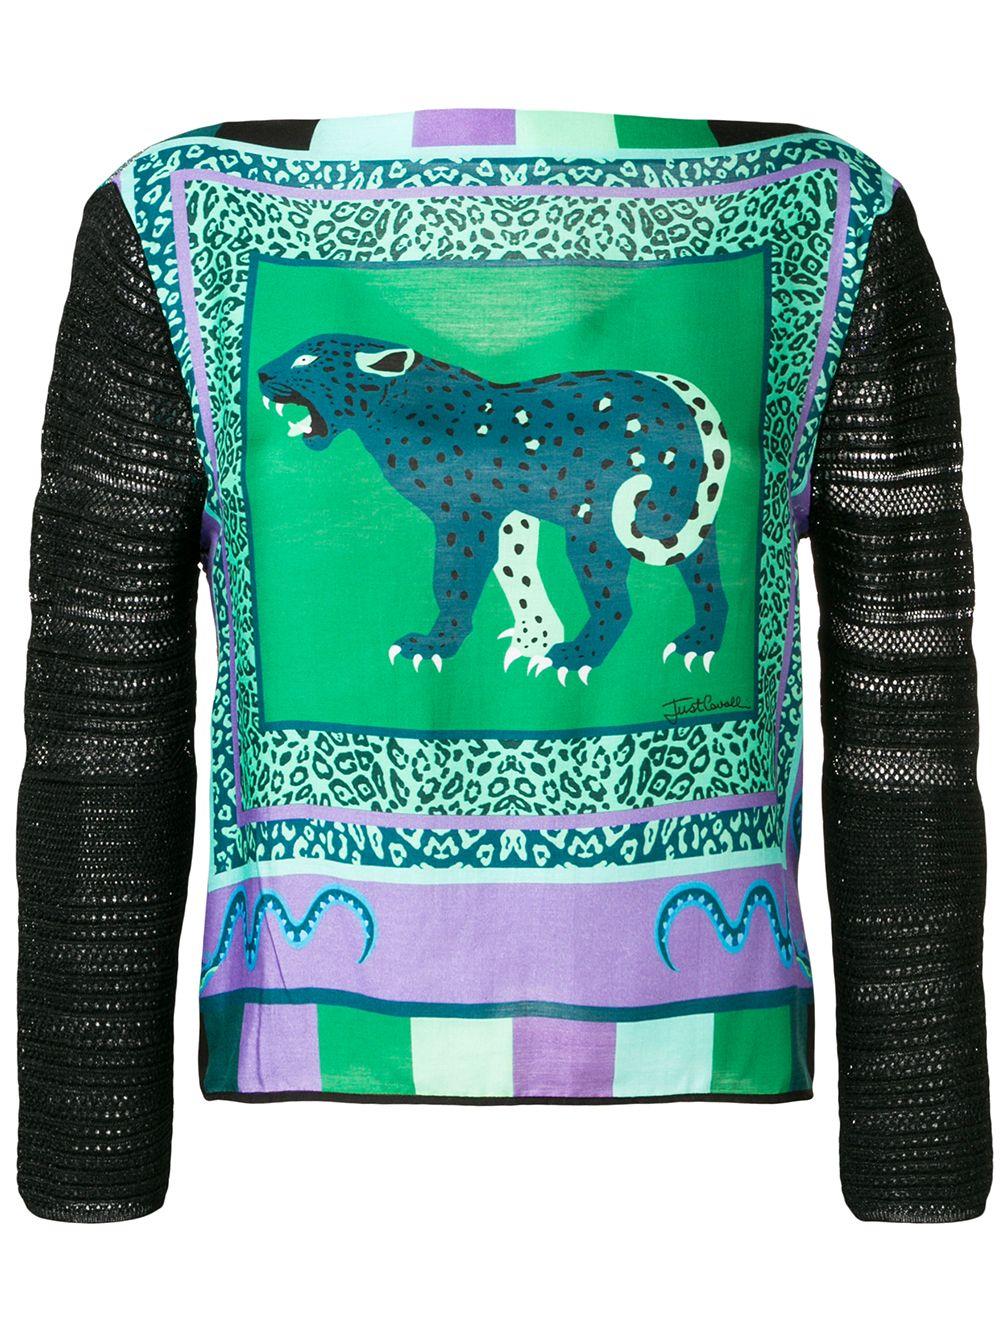 JUST CAVALLI | свитер с вставками и принтом леопарда | Clouty